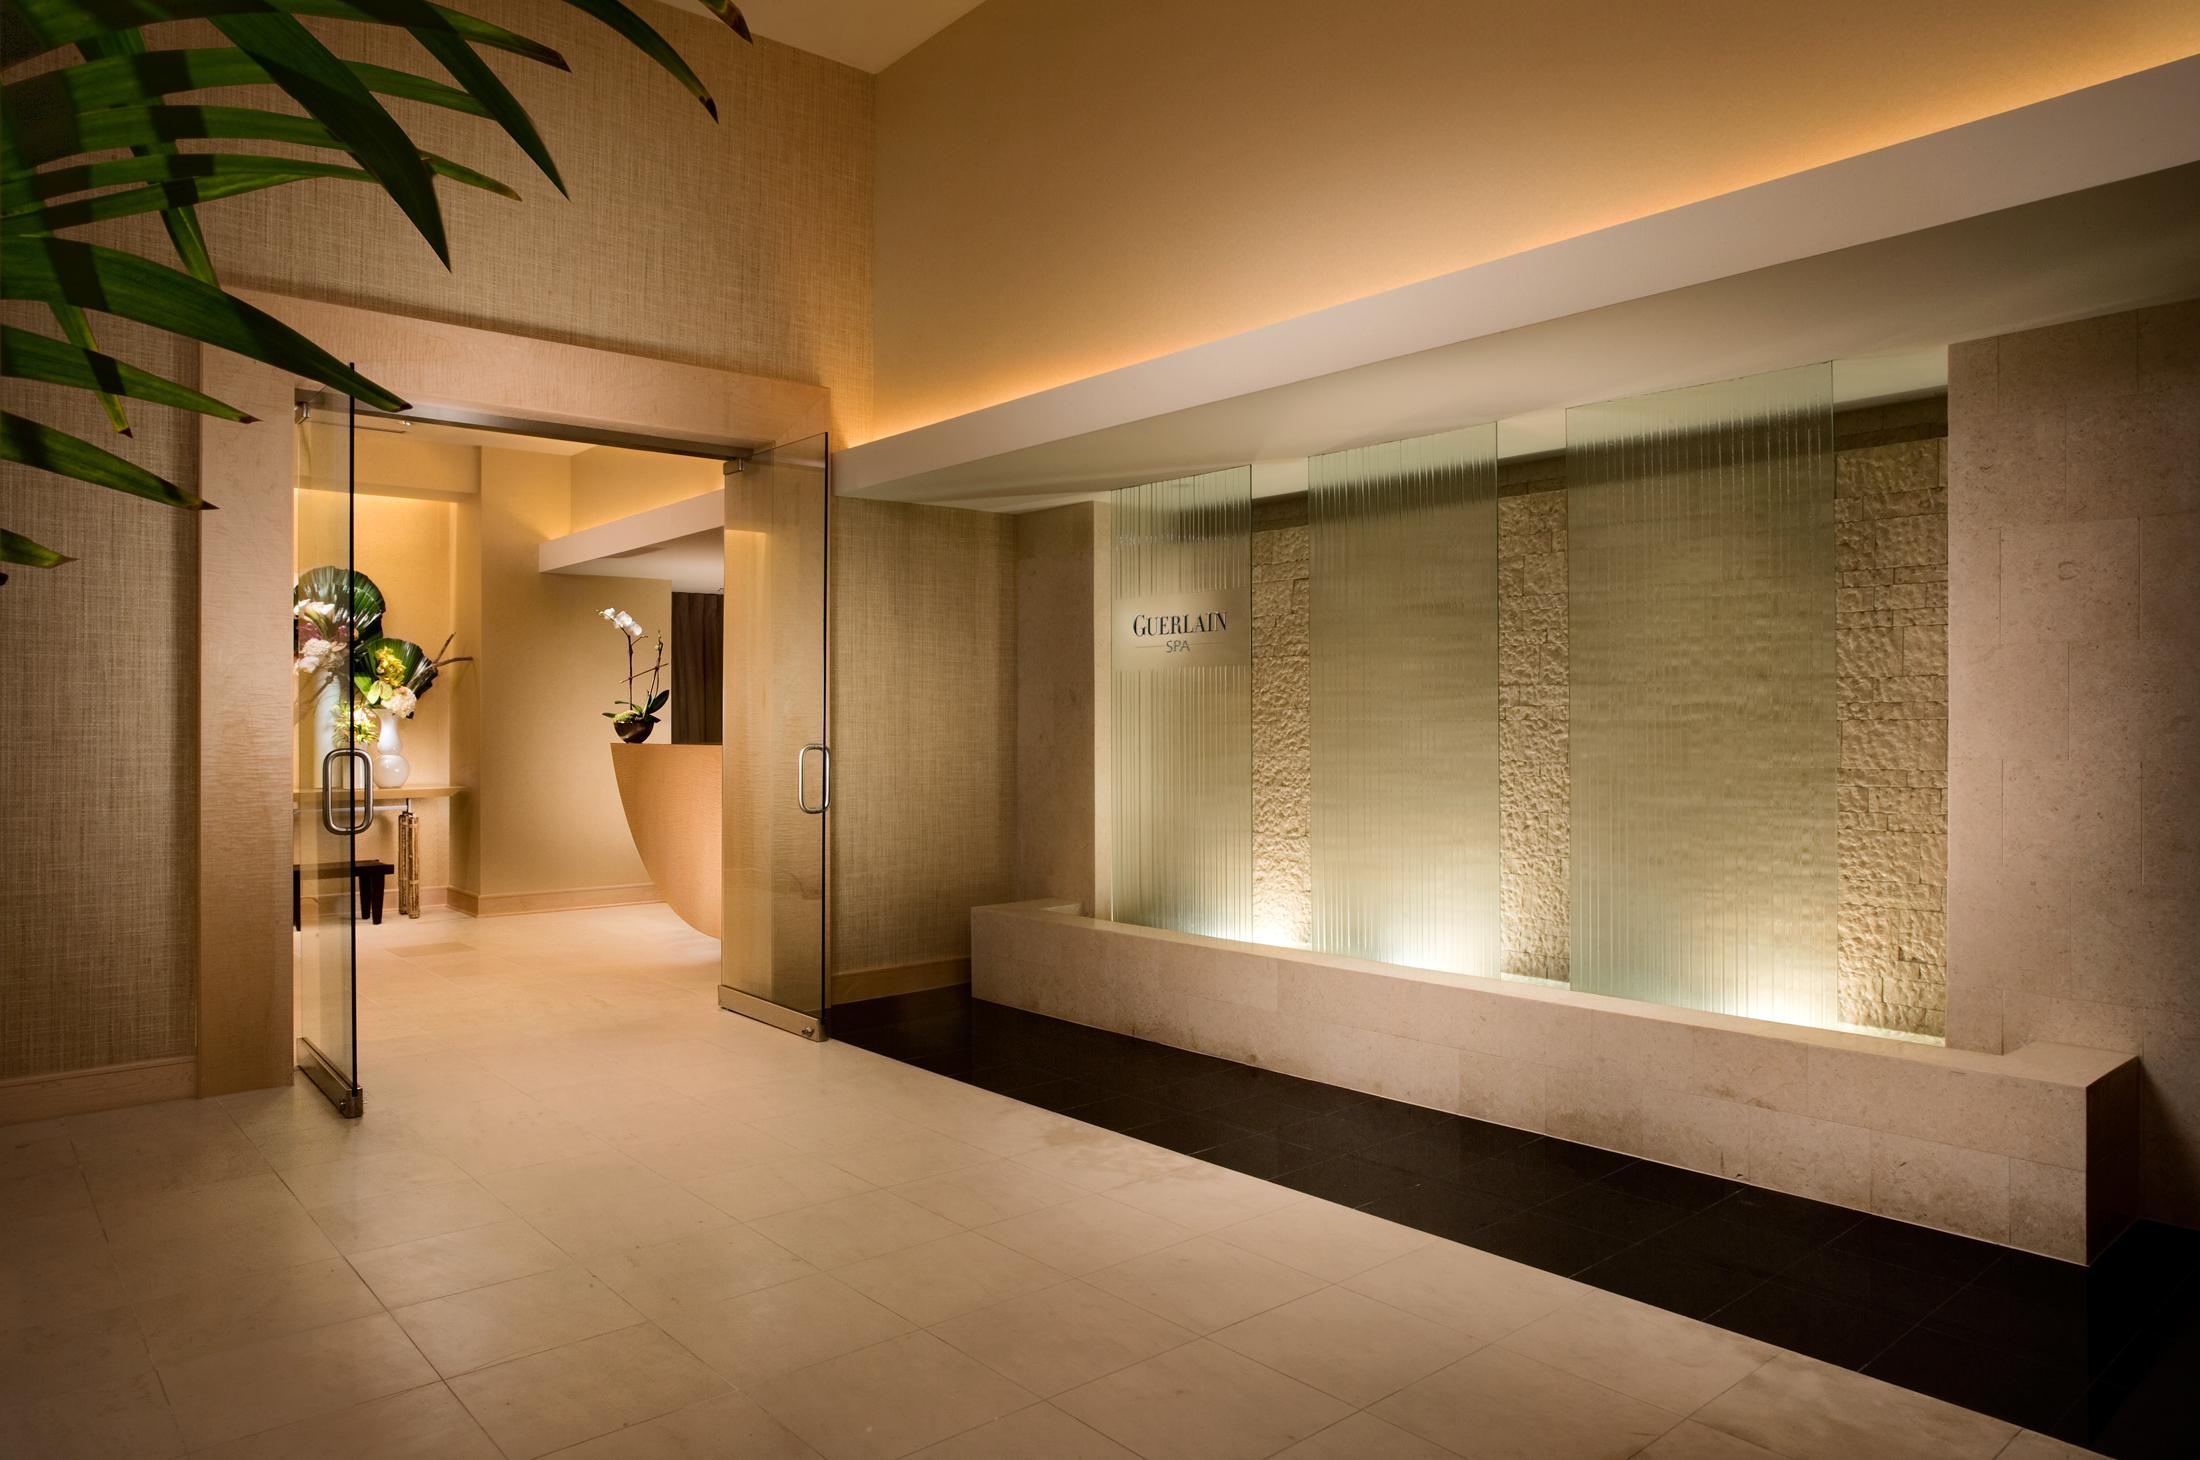 Guerlain Spa  Miami FL  C+TC Design Studio   Back to Portfolios